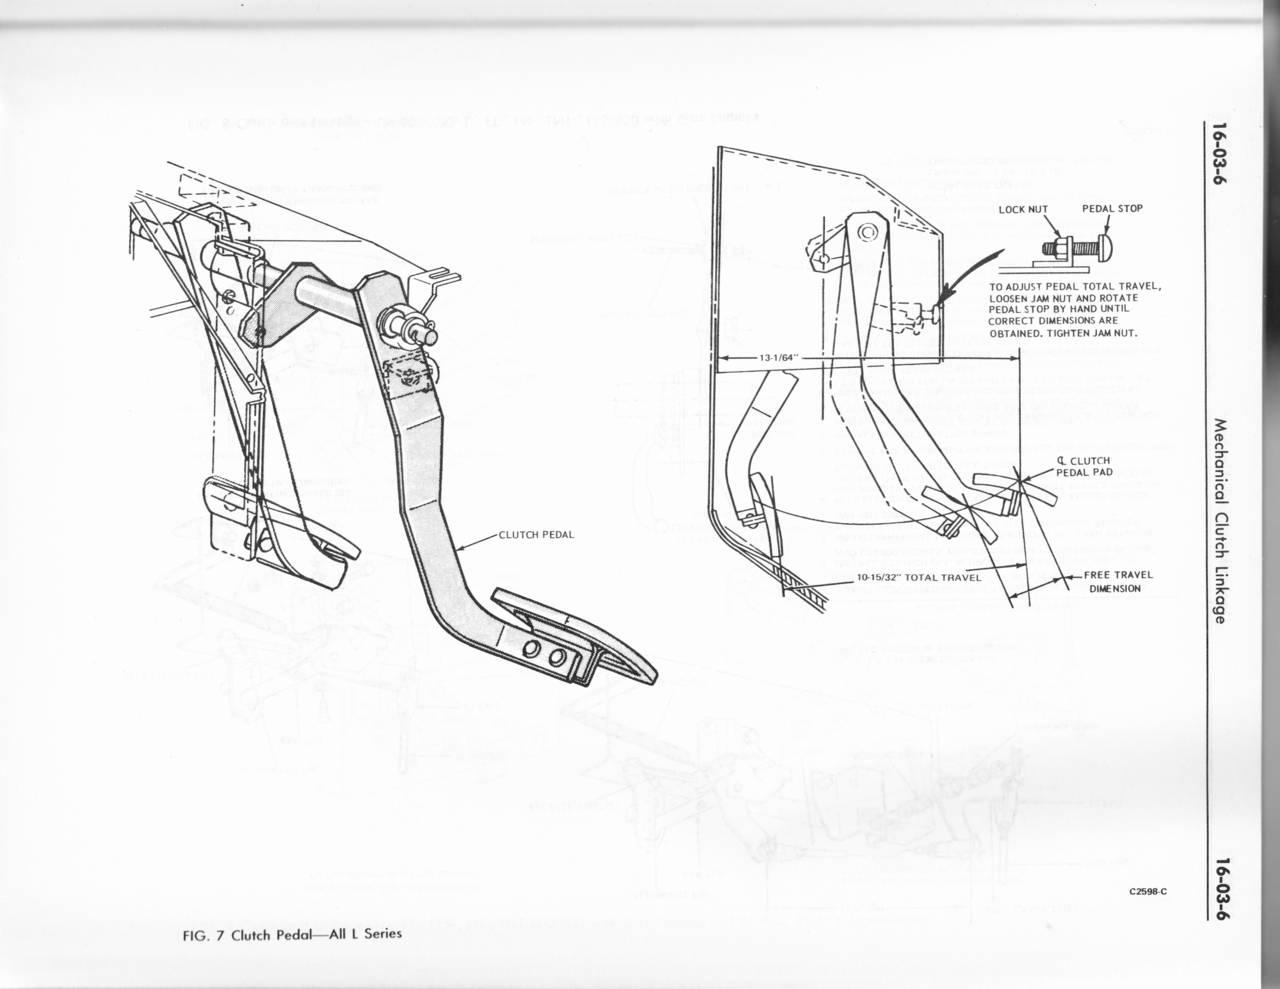 1978 shop manual vol 1 - group 16